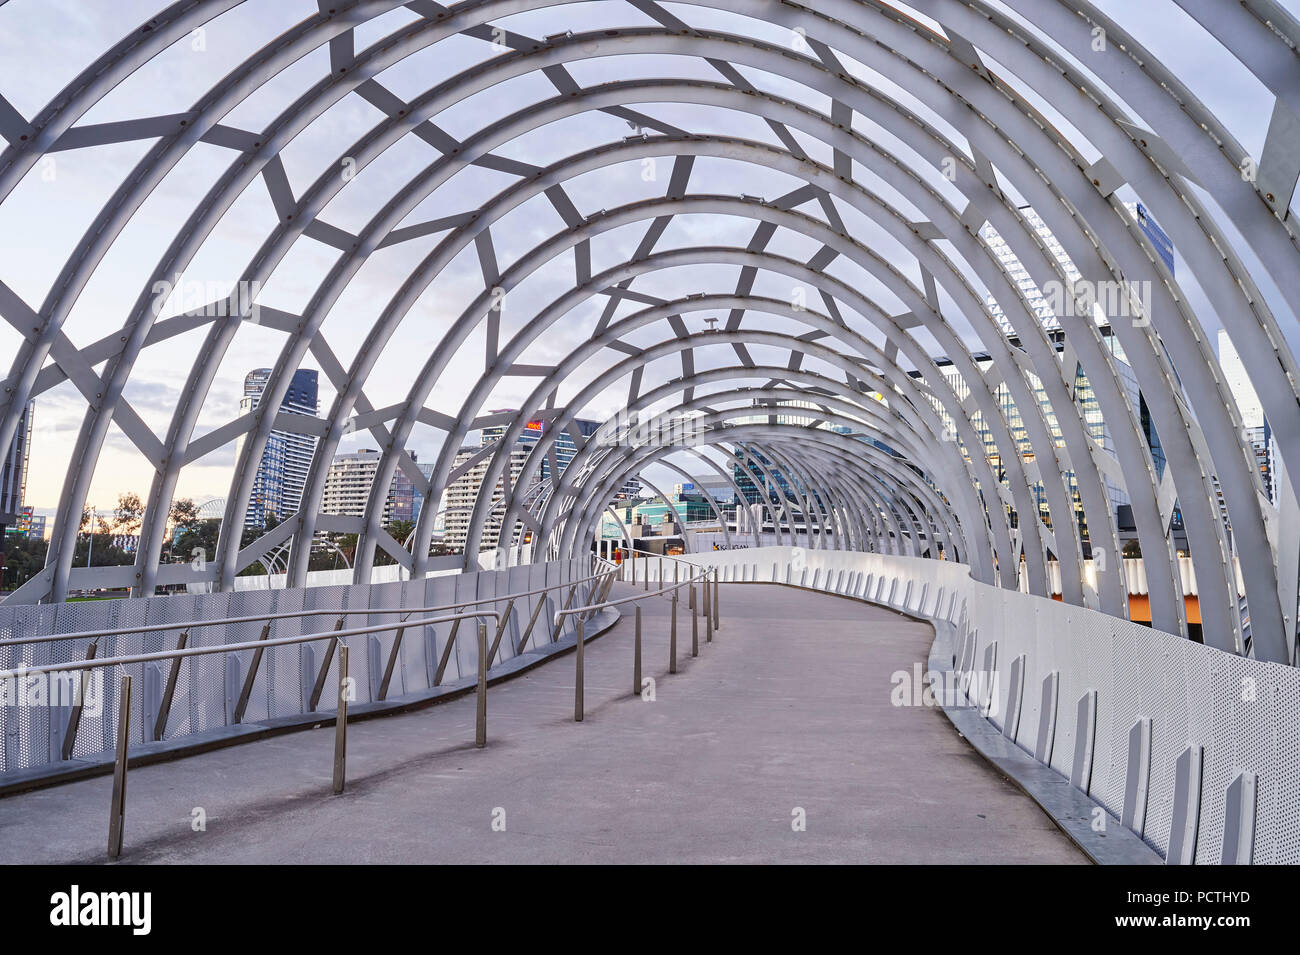 Spider bridge (Webb steel footbridge), Docklands, Docklands, Melbourne, Victoria, Australia, Oceania - Stock Image